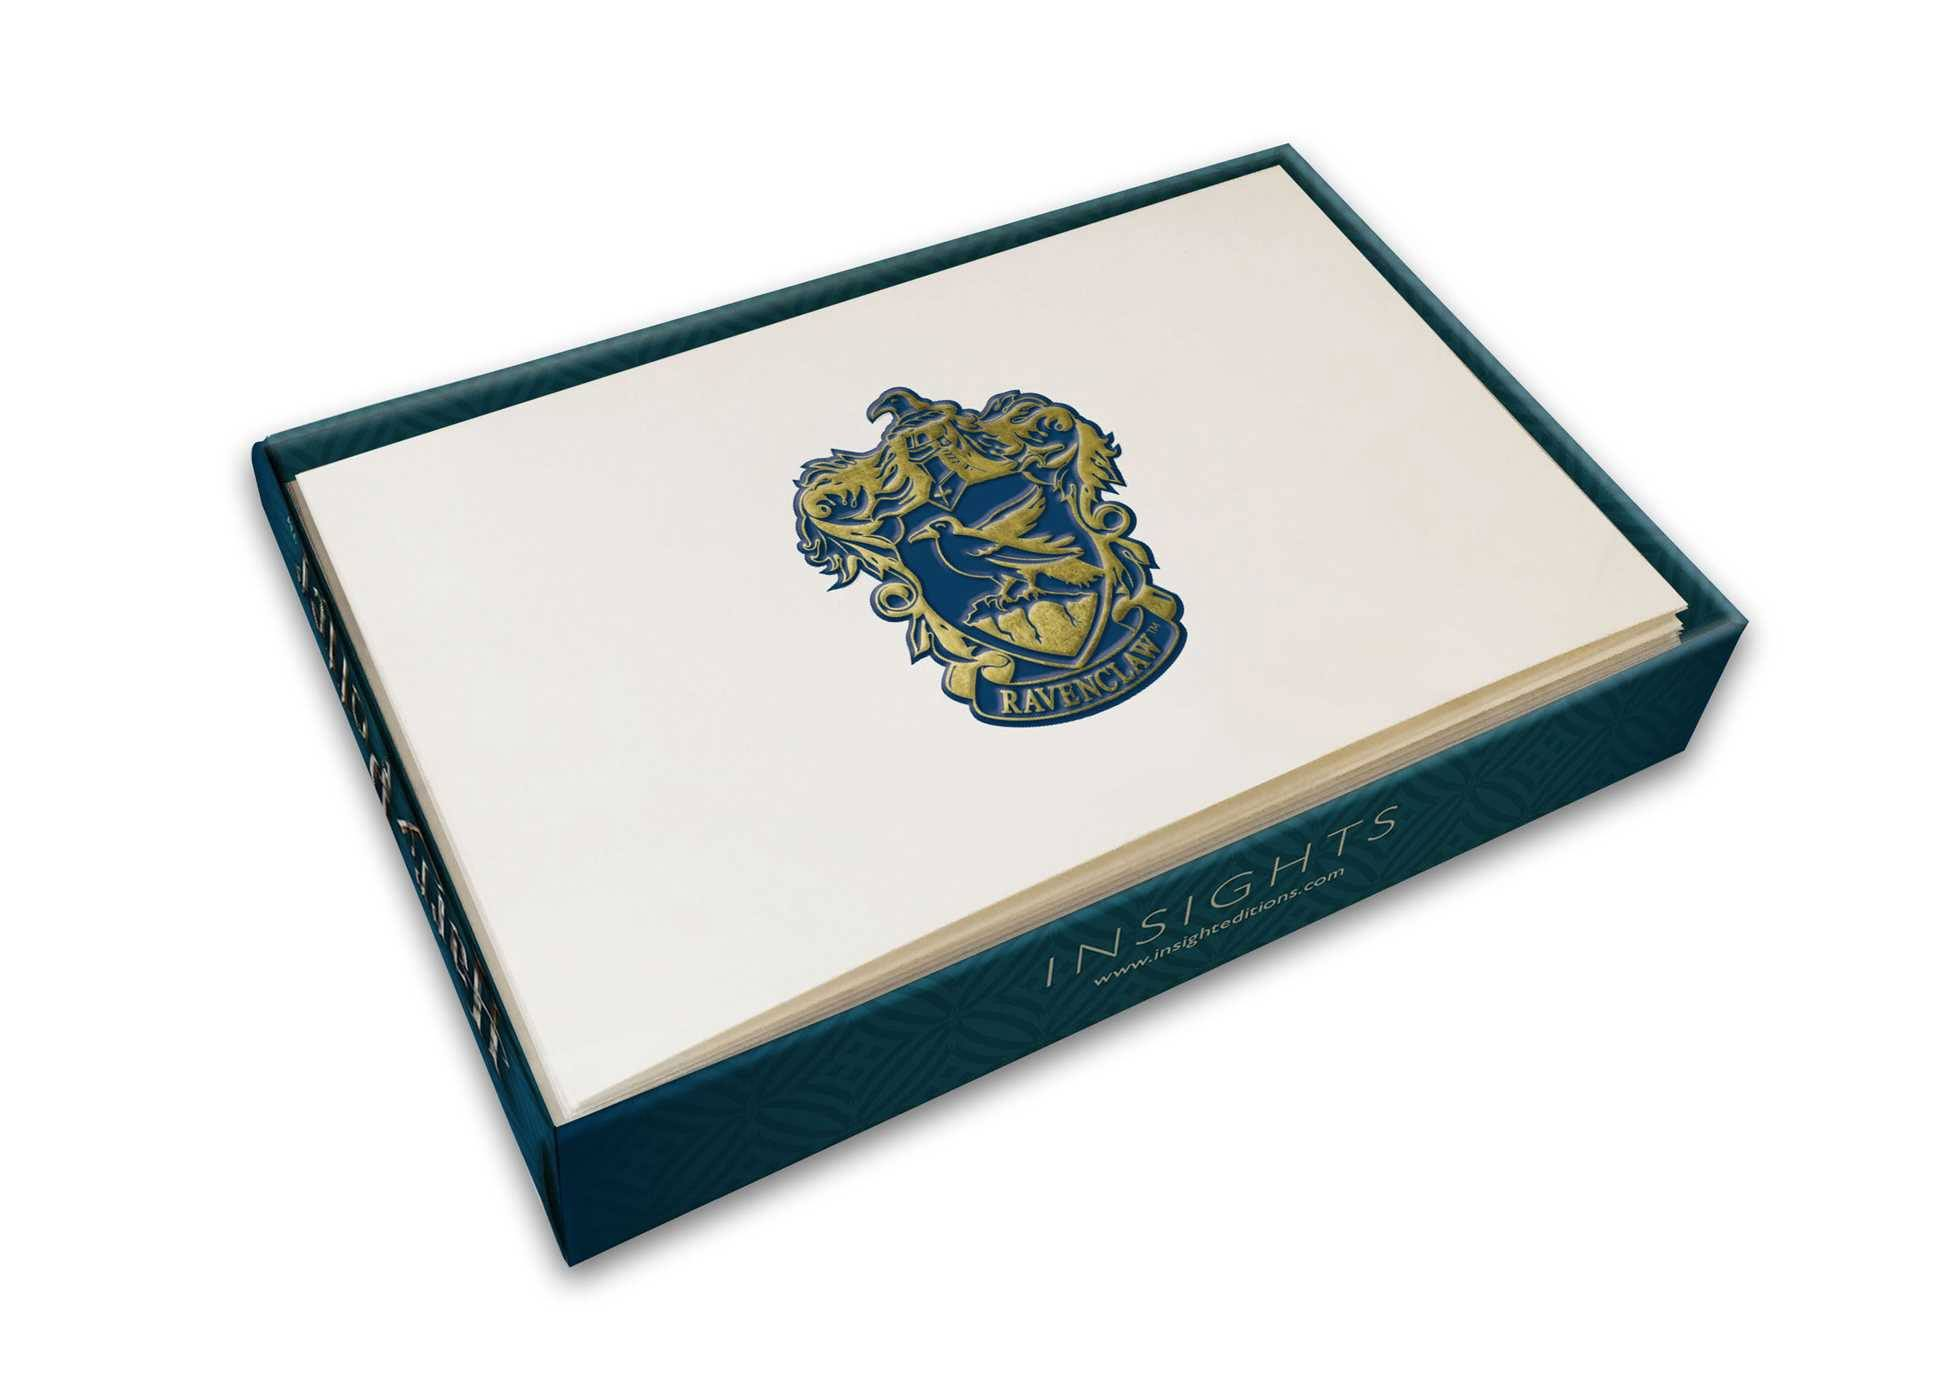 Harry Potter Foil Gift Enclosure Cards 10-Pack Ravenclaw 89 x 56 mm